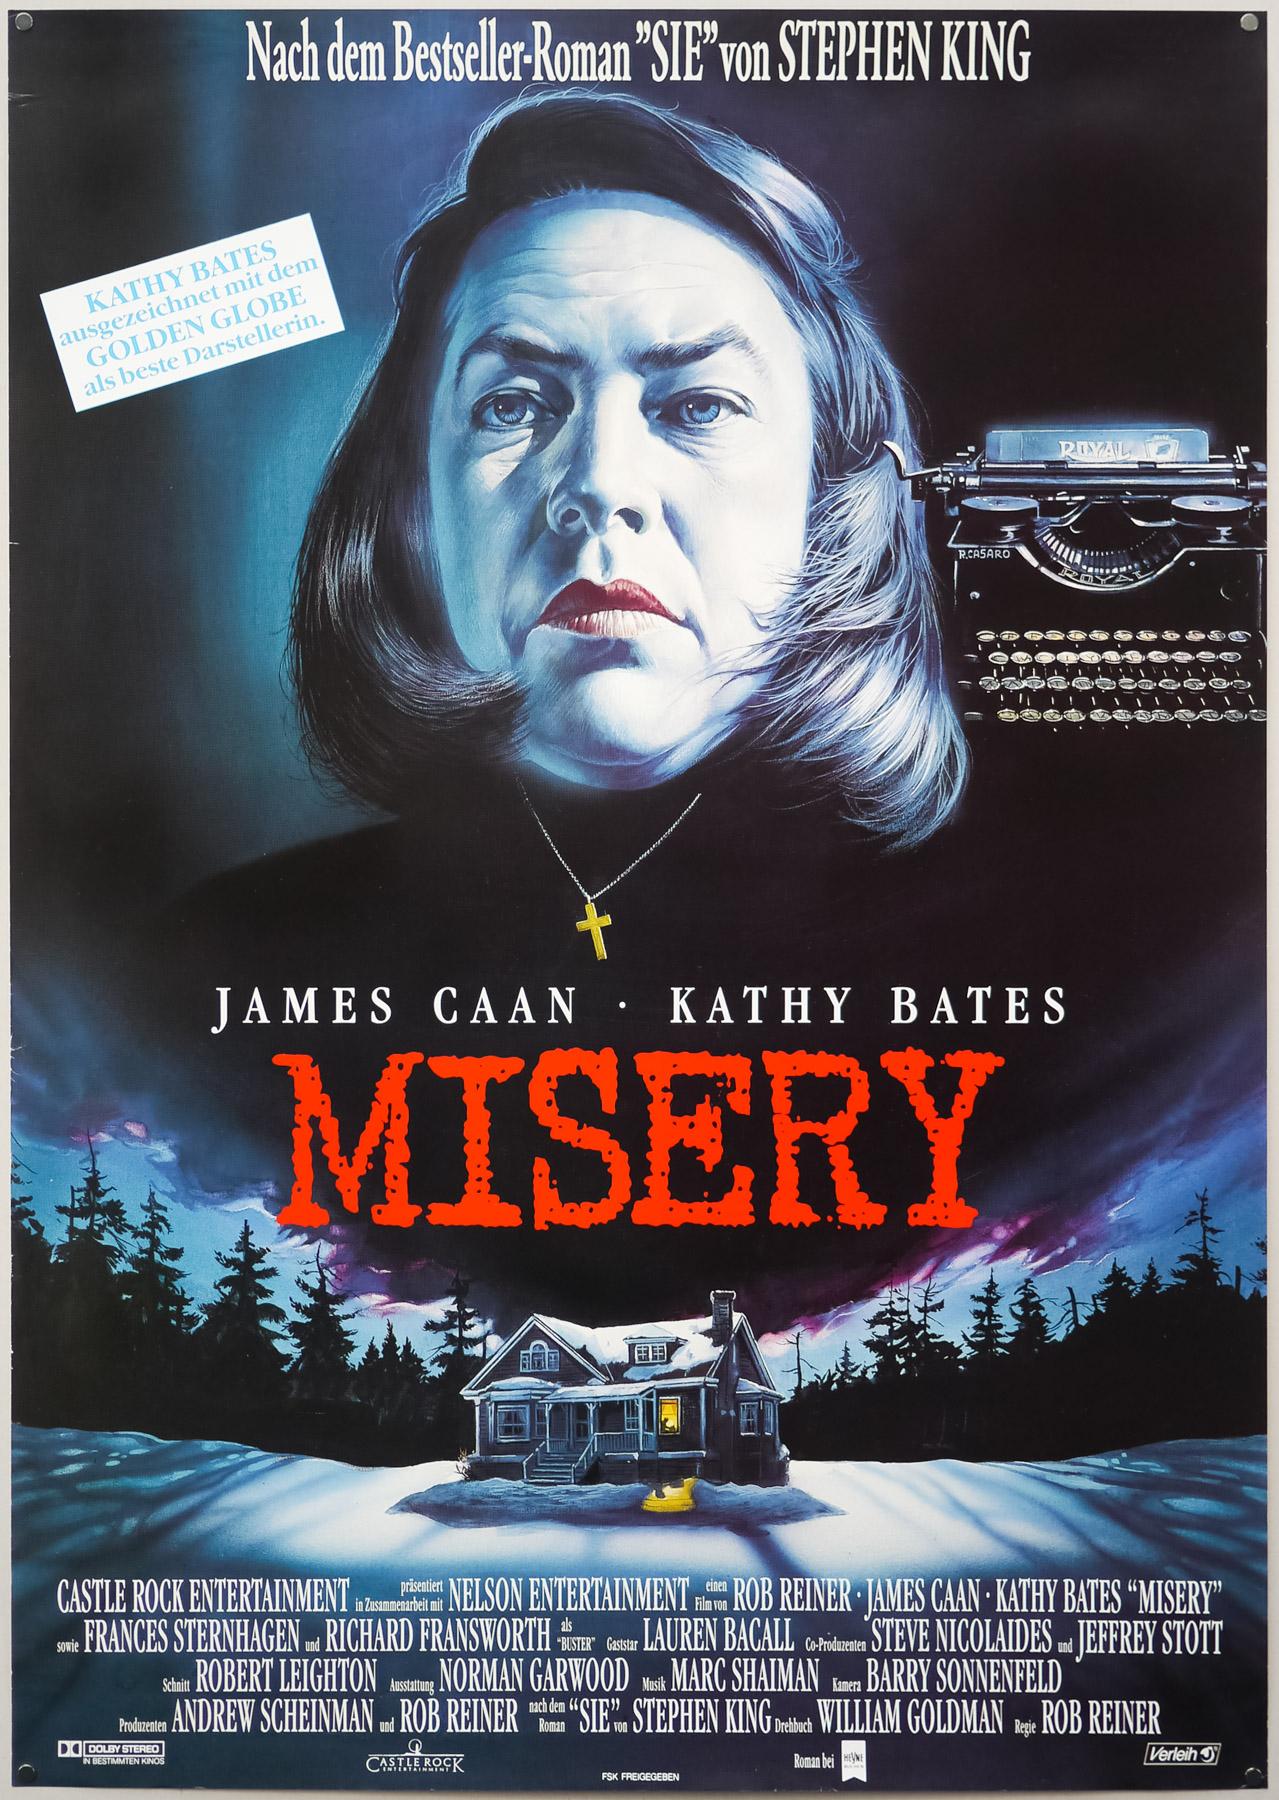 Misery German poster